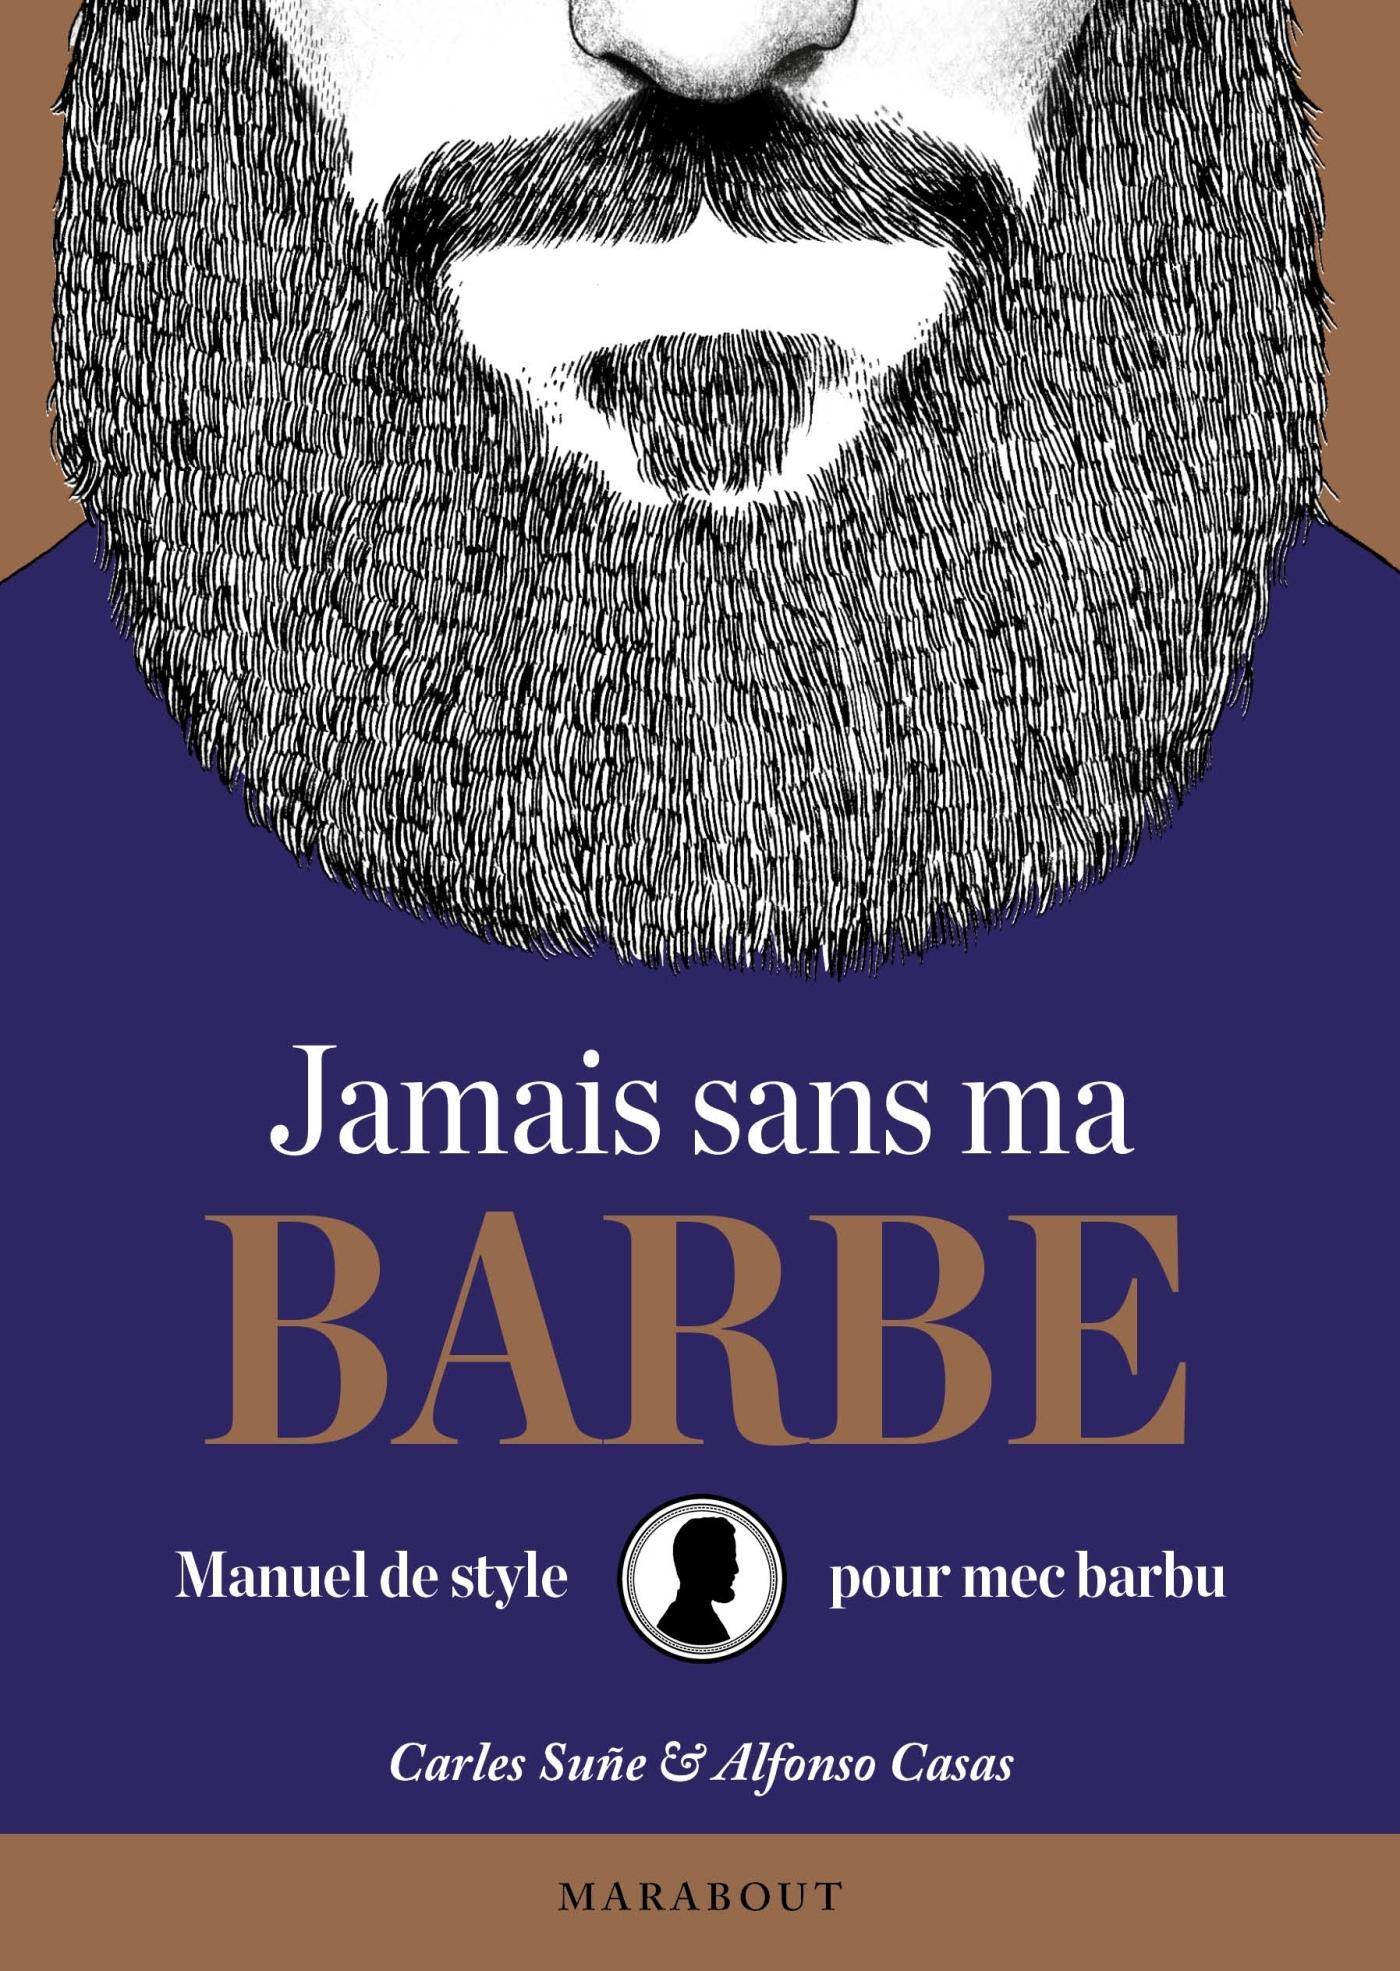 JAMAIS SANS MA BARBE